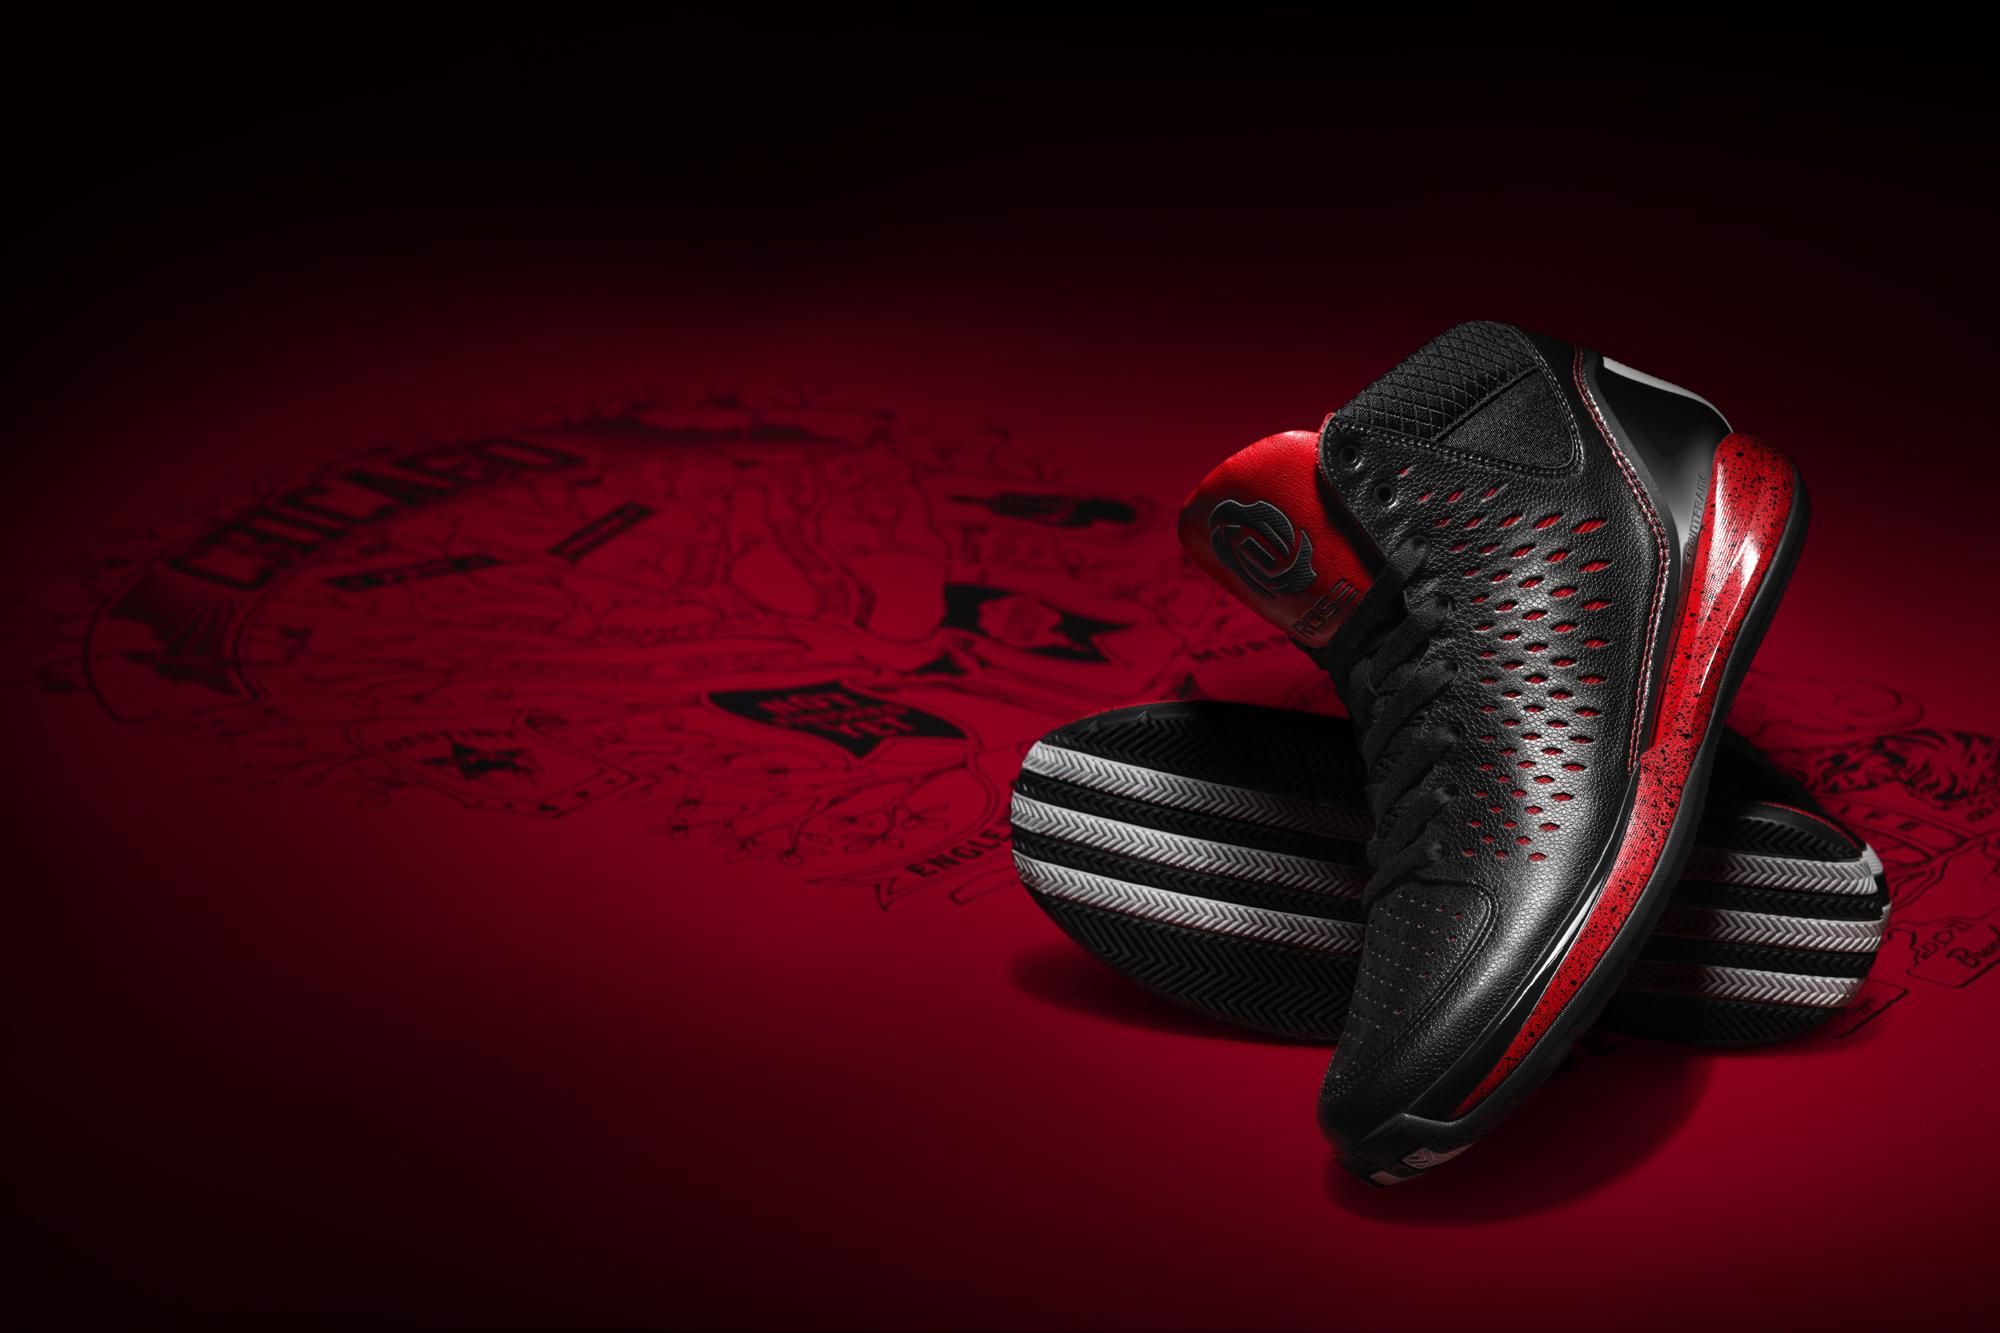 Adidas Rose 3.5 Vs 3.0